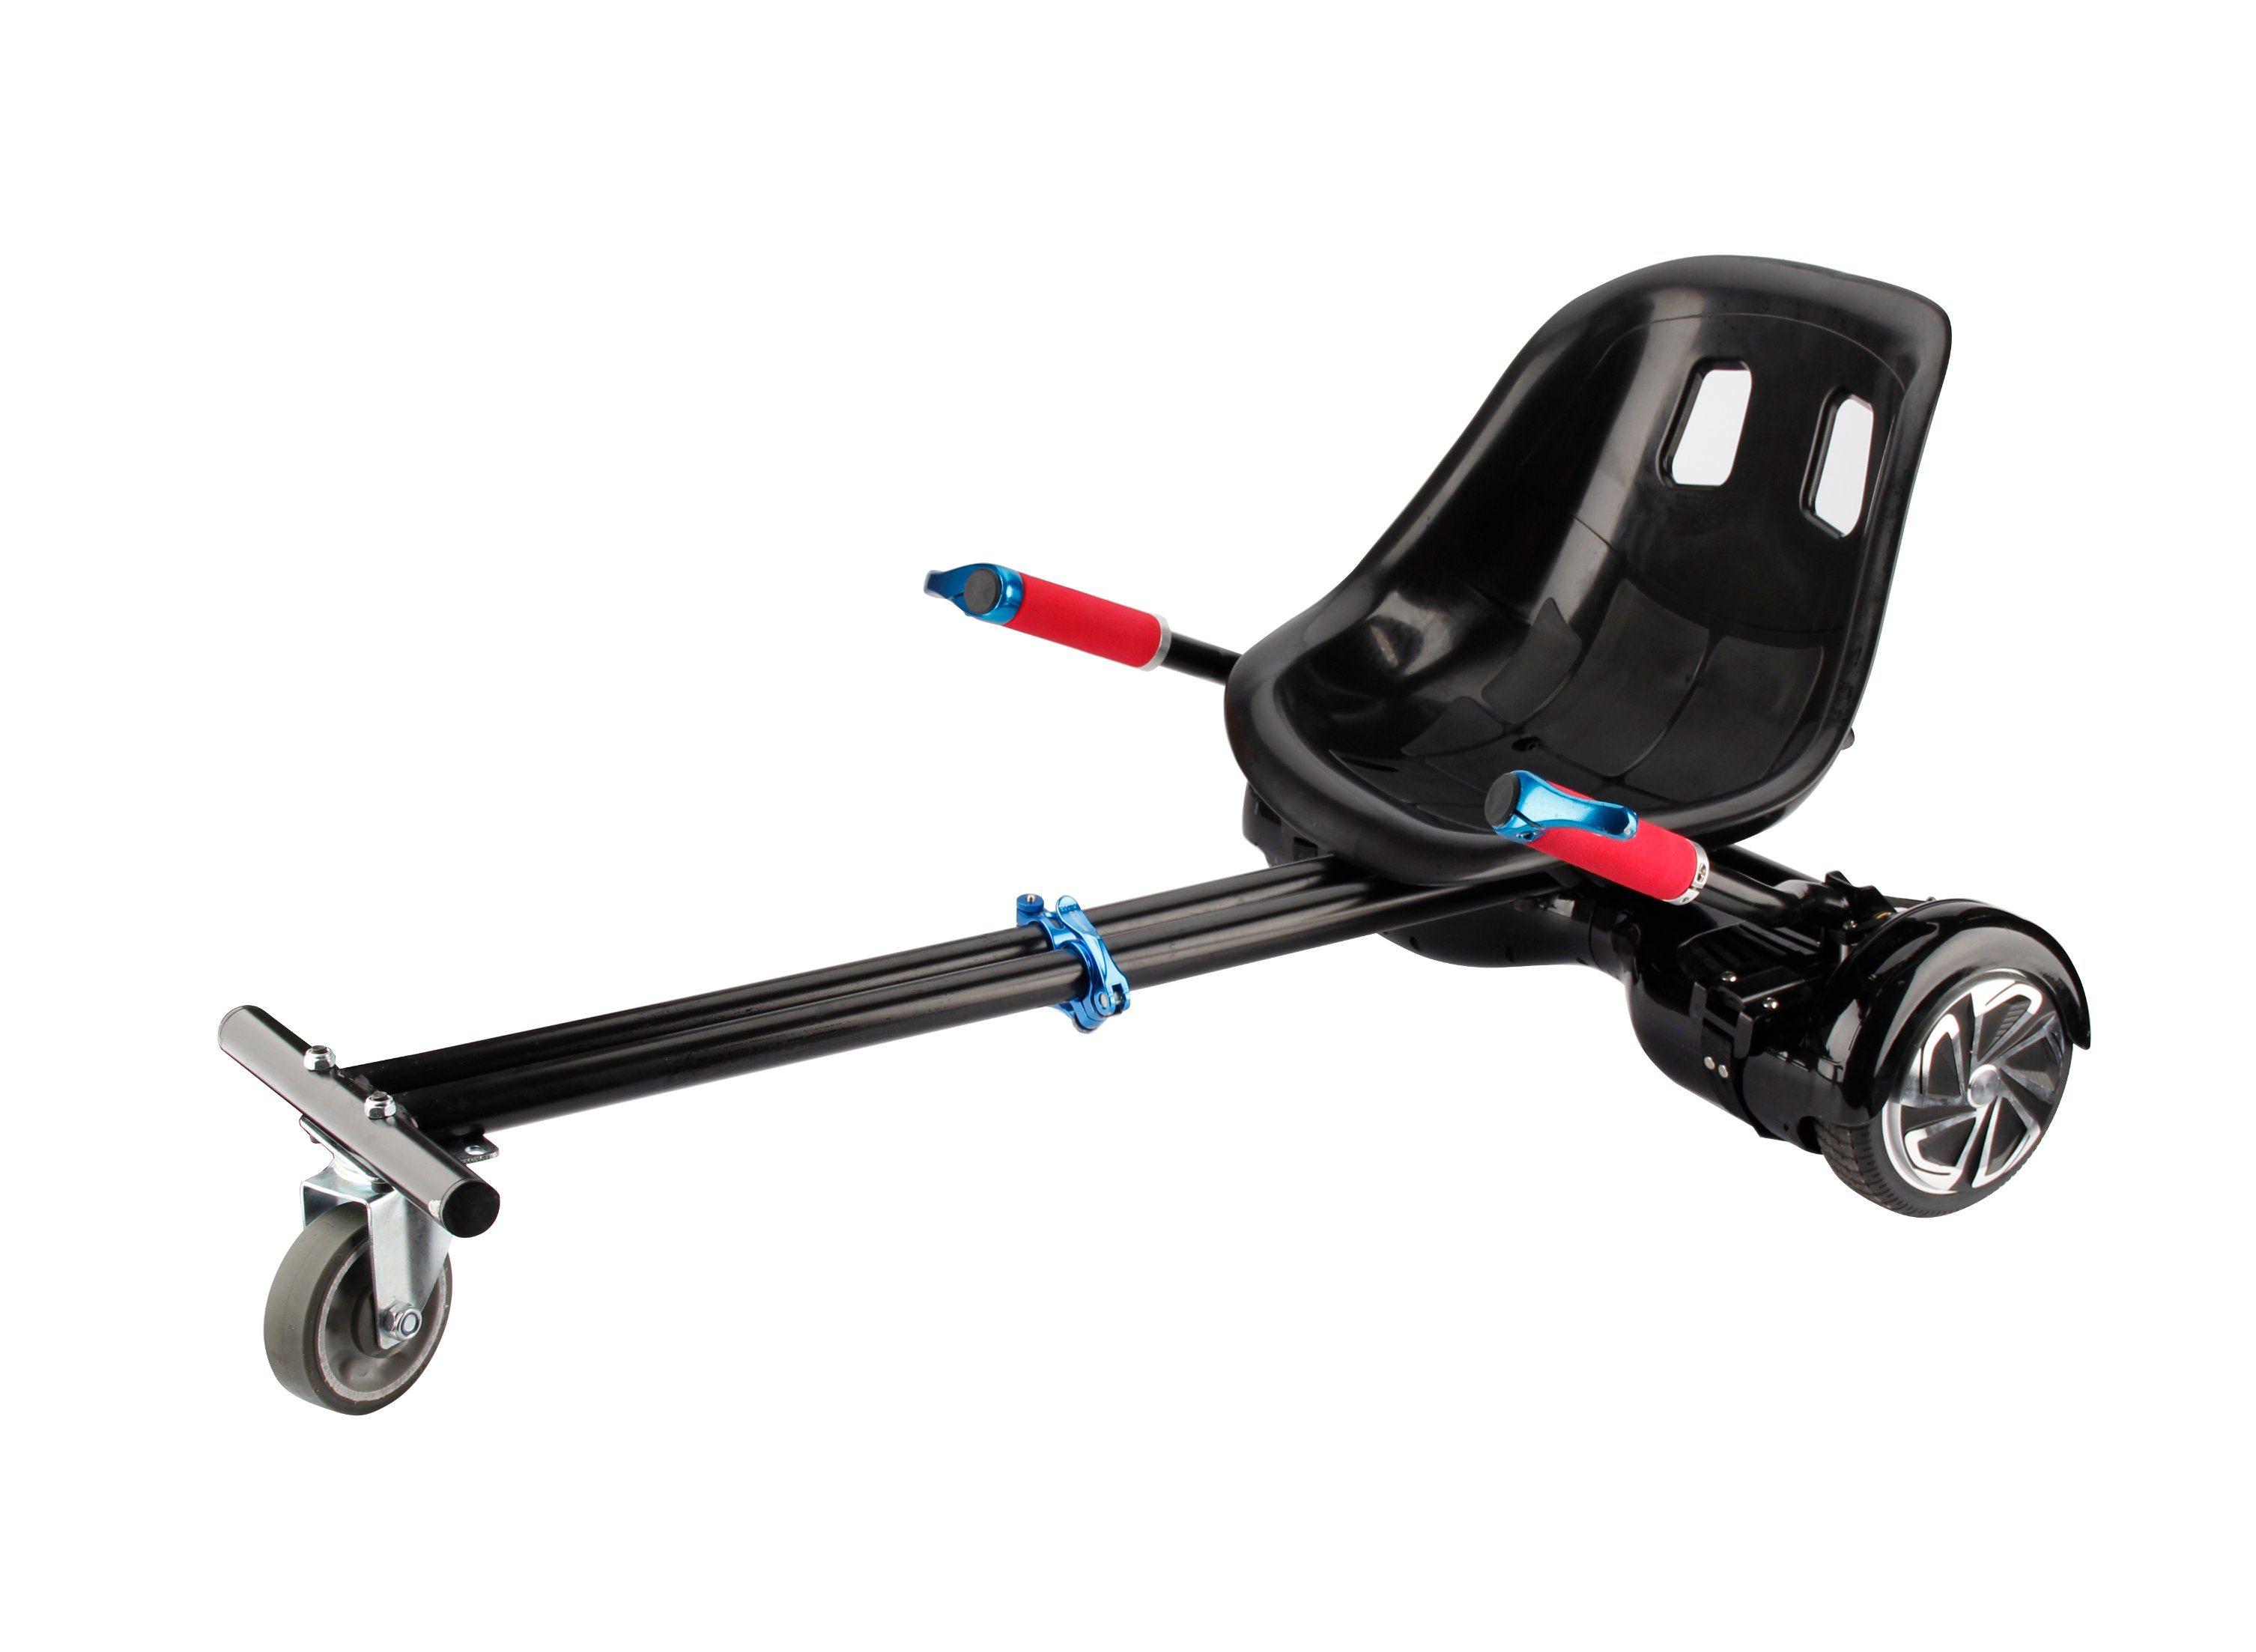 Smart Balance Wheel Hoverboard Go Cart Hoverkart/Go Kart Hover Kart